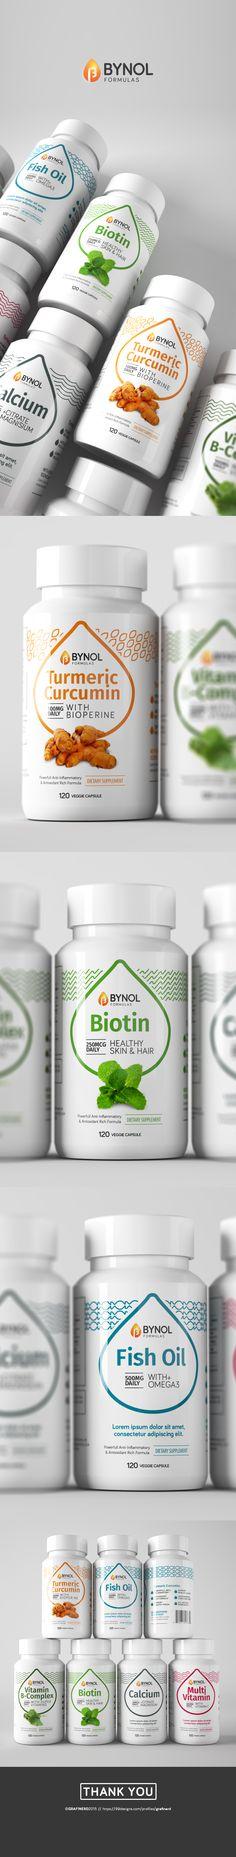 Bynol Formula | 99designs Medical Packaging, Tea Packaging, Bottle Packaging, Bottle Mockup, Beauty Packaging, Types Of Packaging, Container Design, Layout Template, Packaging Design Inspiration